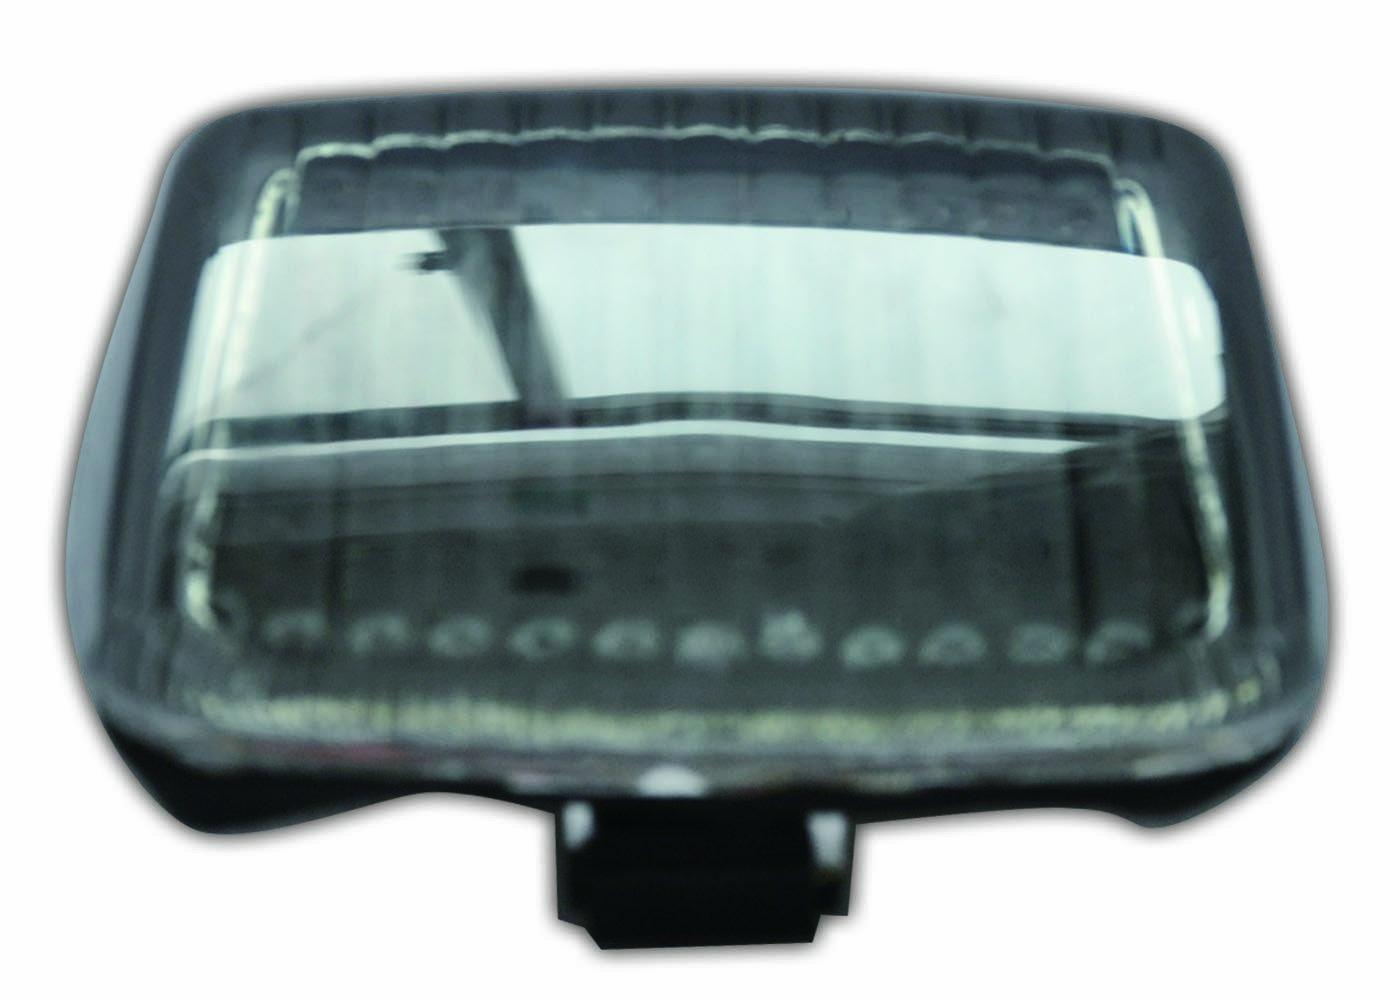 TZHD-114-INT-S Smoke Integrated Tail Light Top Zone